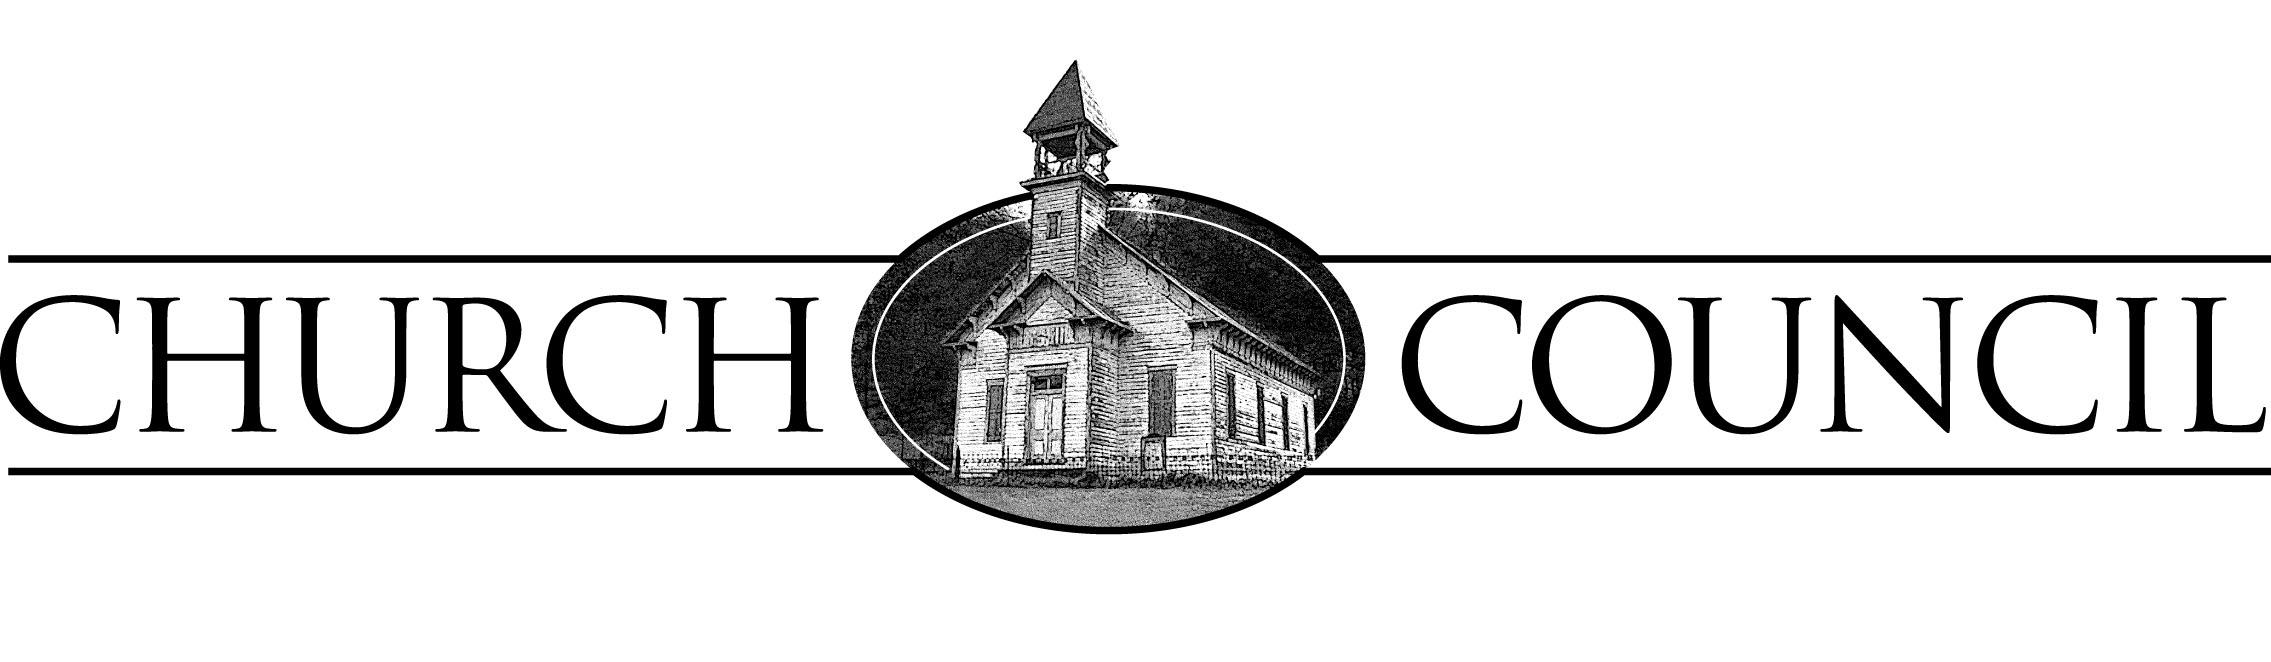 Meeting clipart church member Council Church lutheran Council Meeting